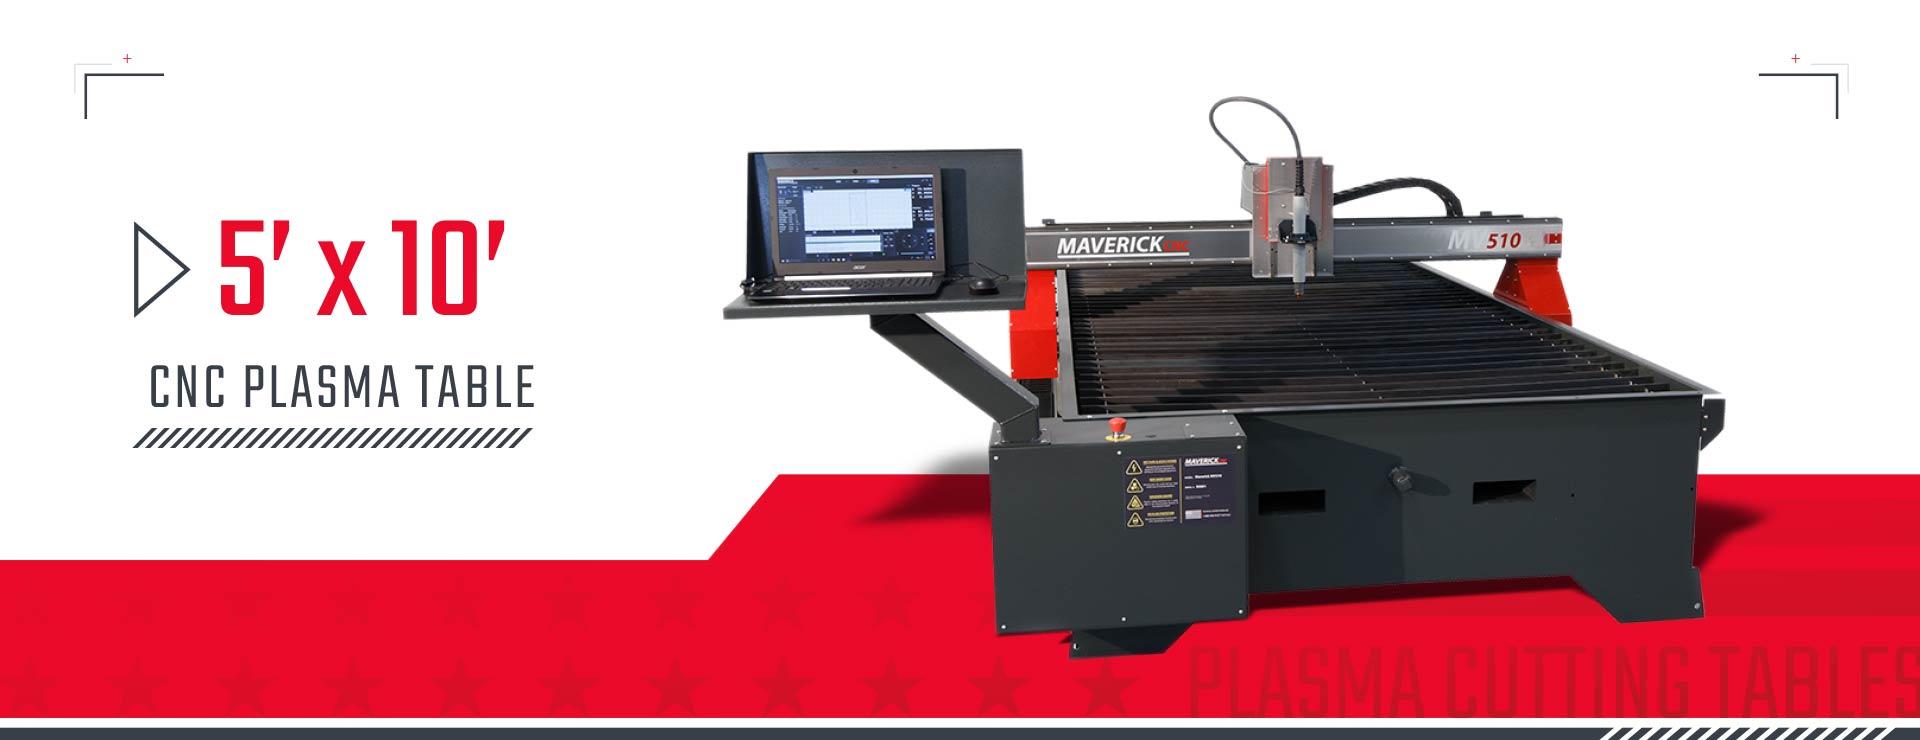 MV510 CNC Plasma Cutter